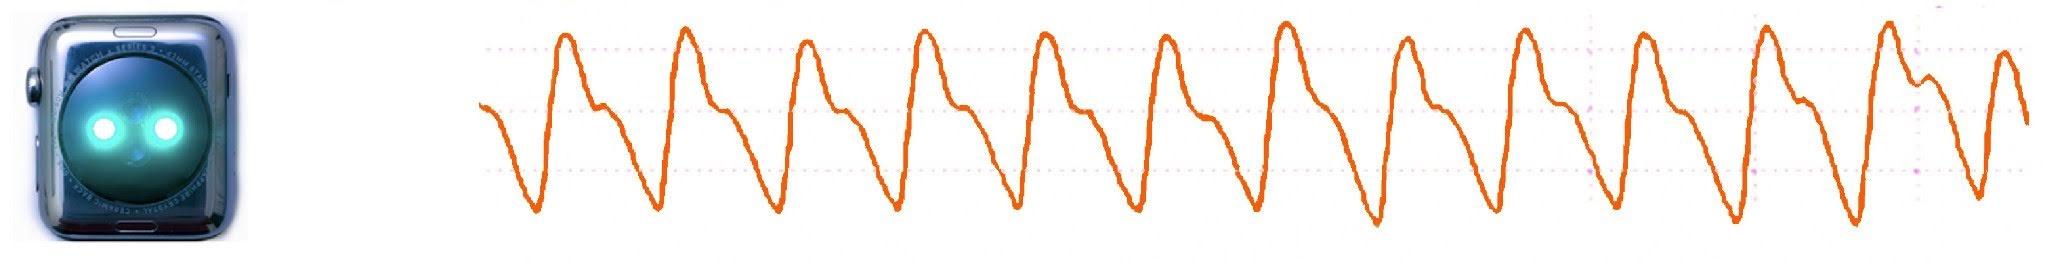 PPG-Sensor und Tachogramm